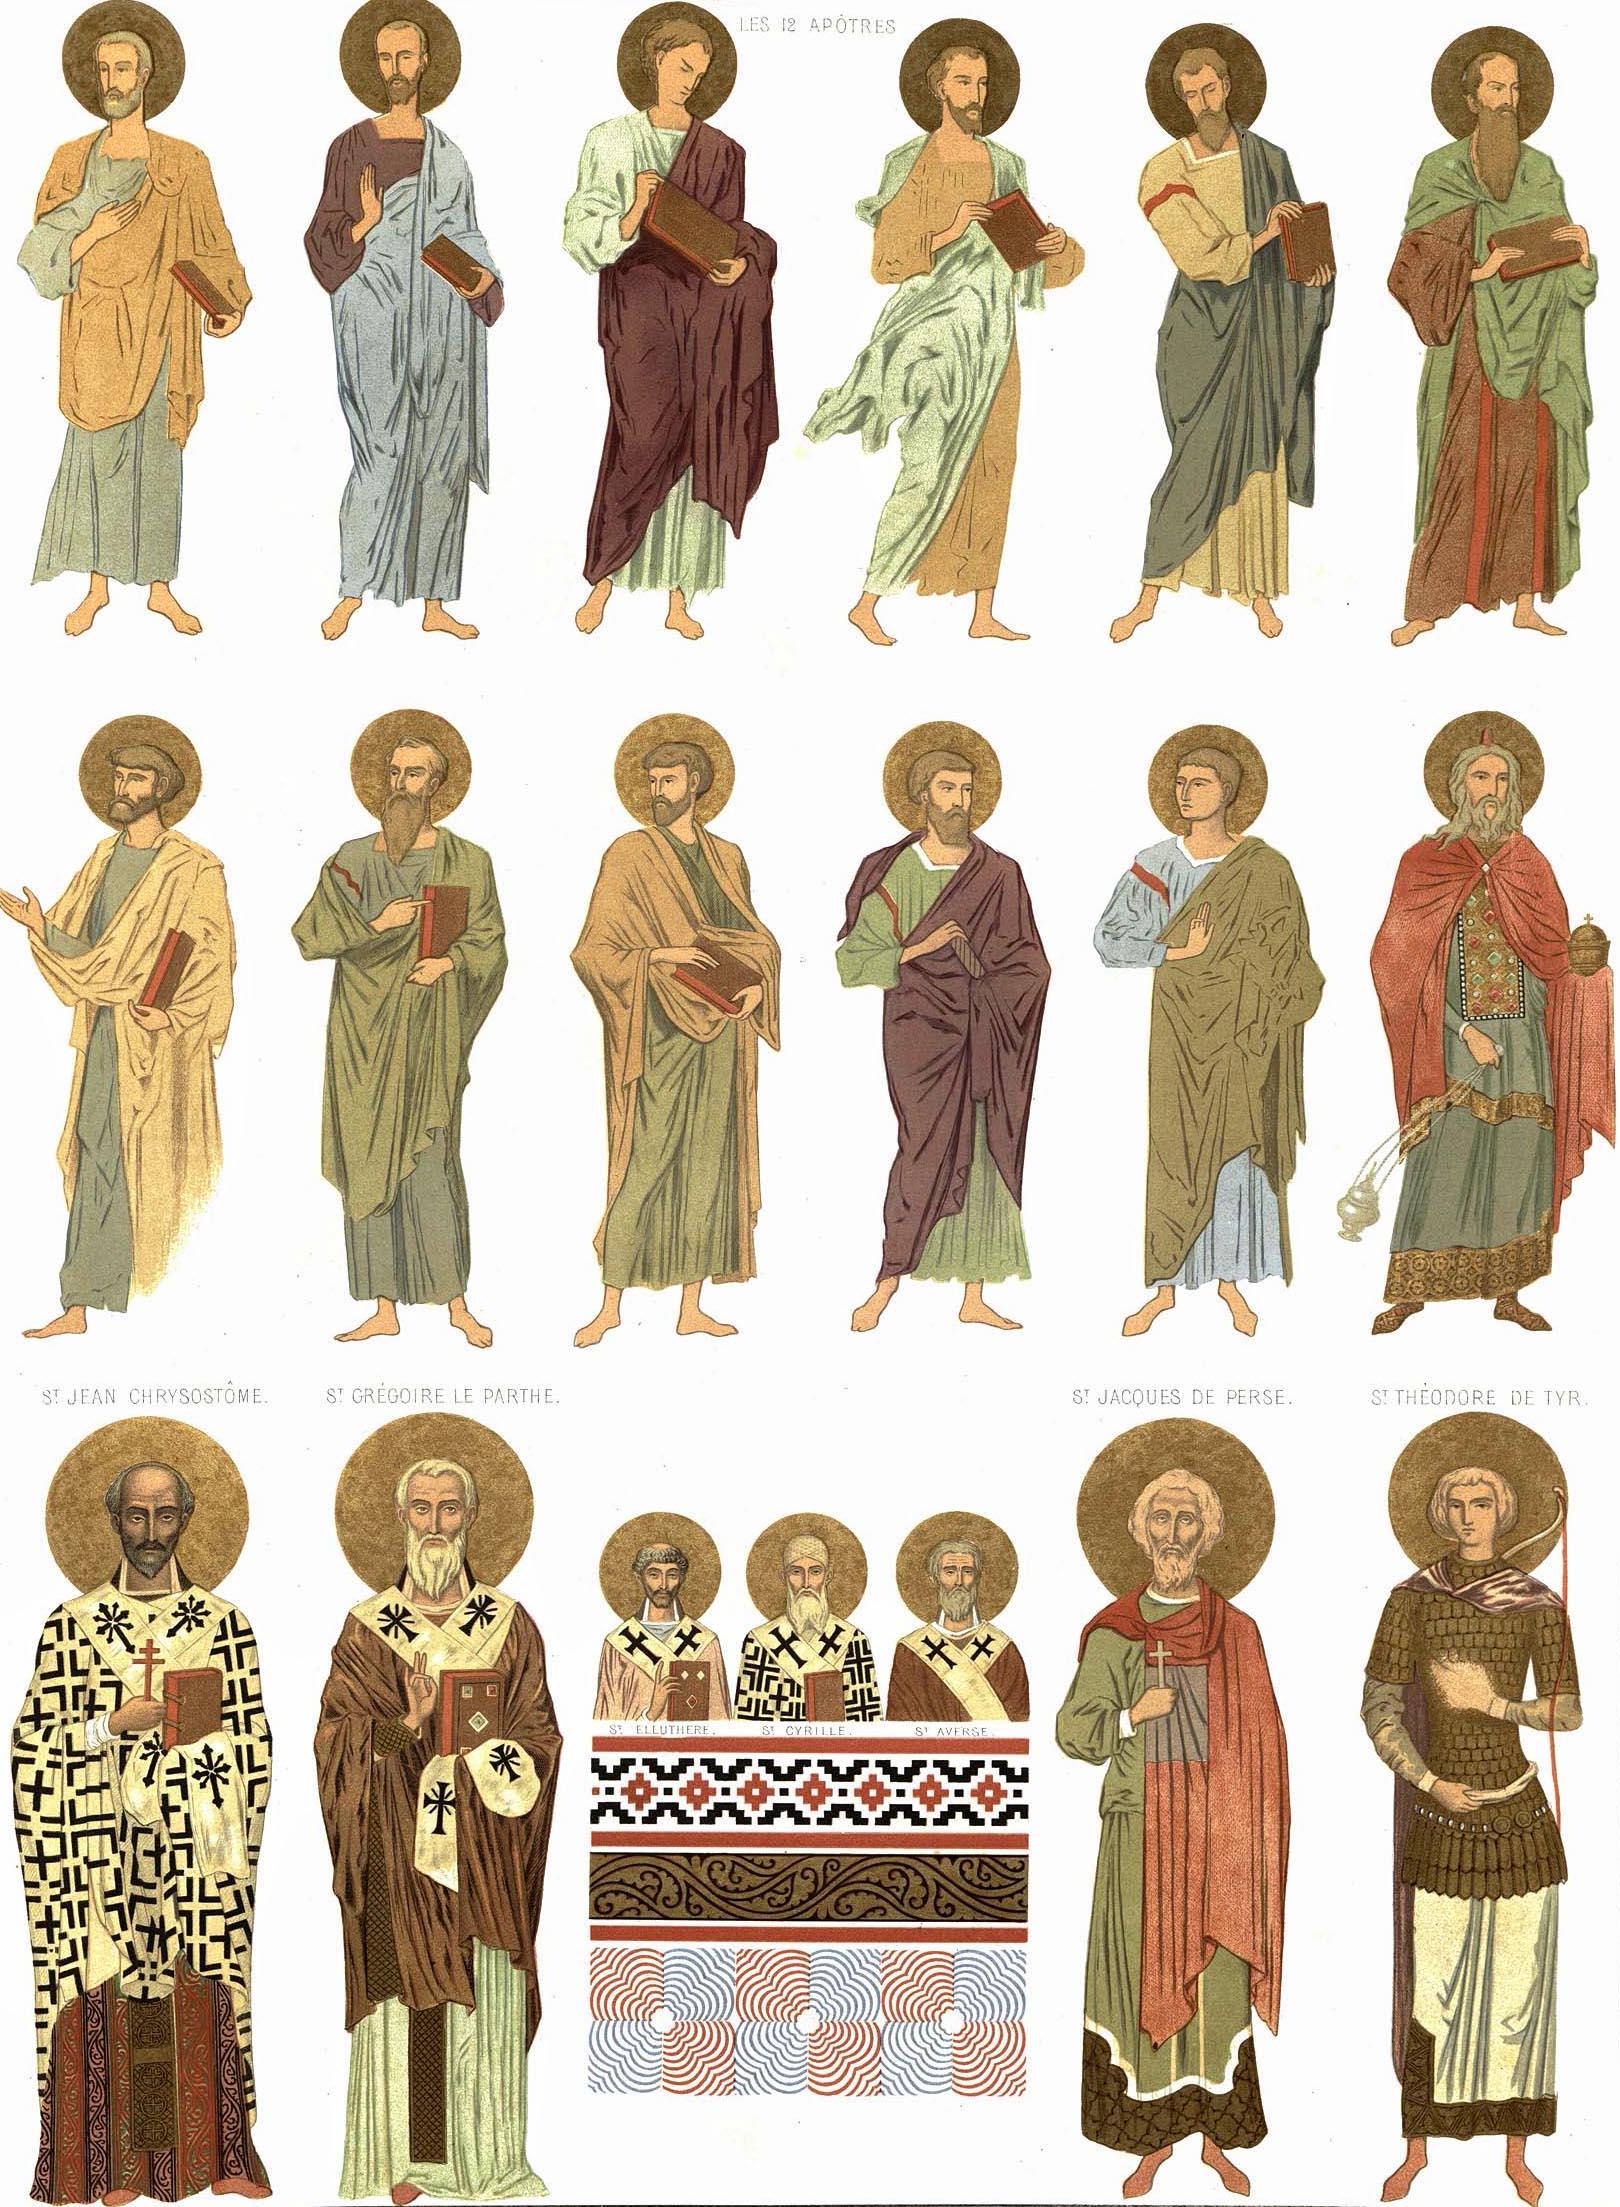 38. Georgie. Eglise de Bethanie, peintures murales / Грузия. Монастырь Бетани. Фрески. 12 апостолов и другие святые